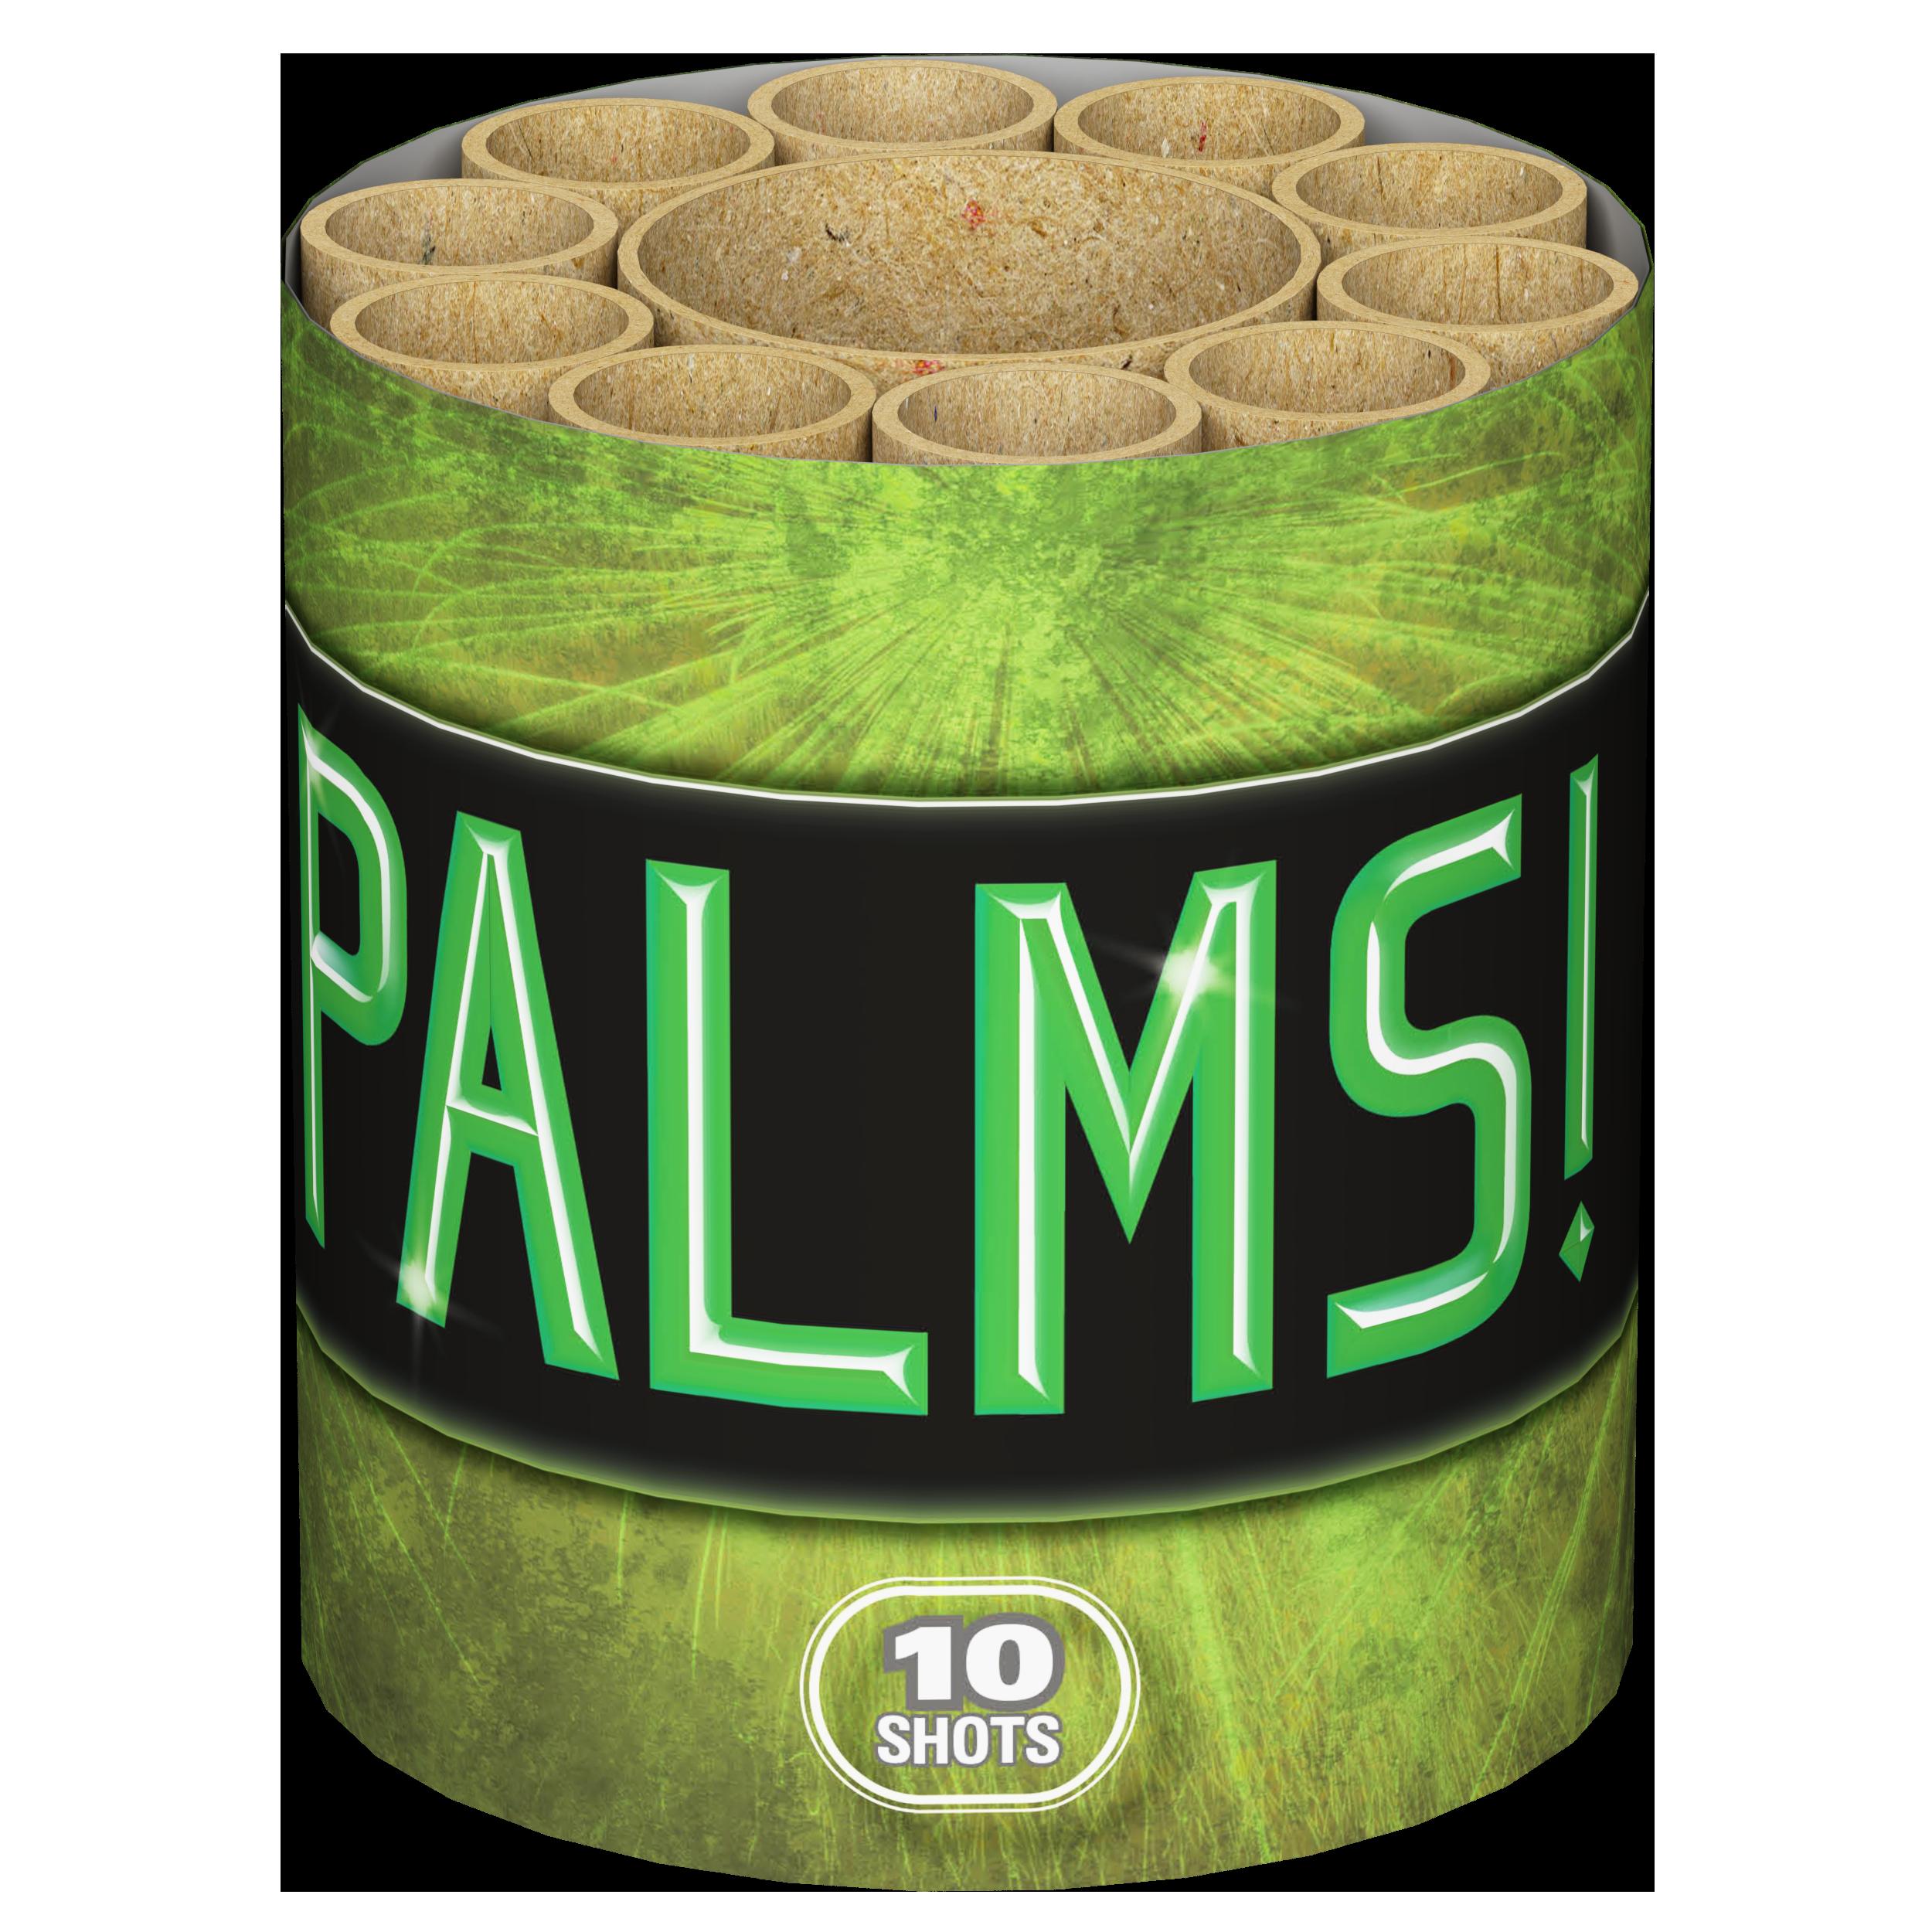 Lesli Palms